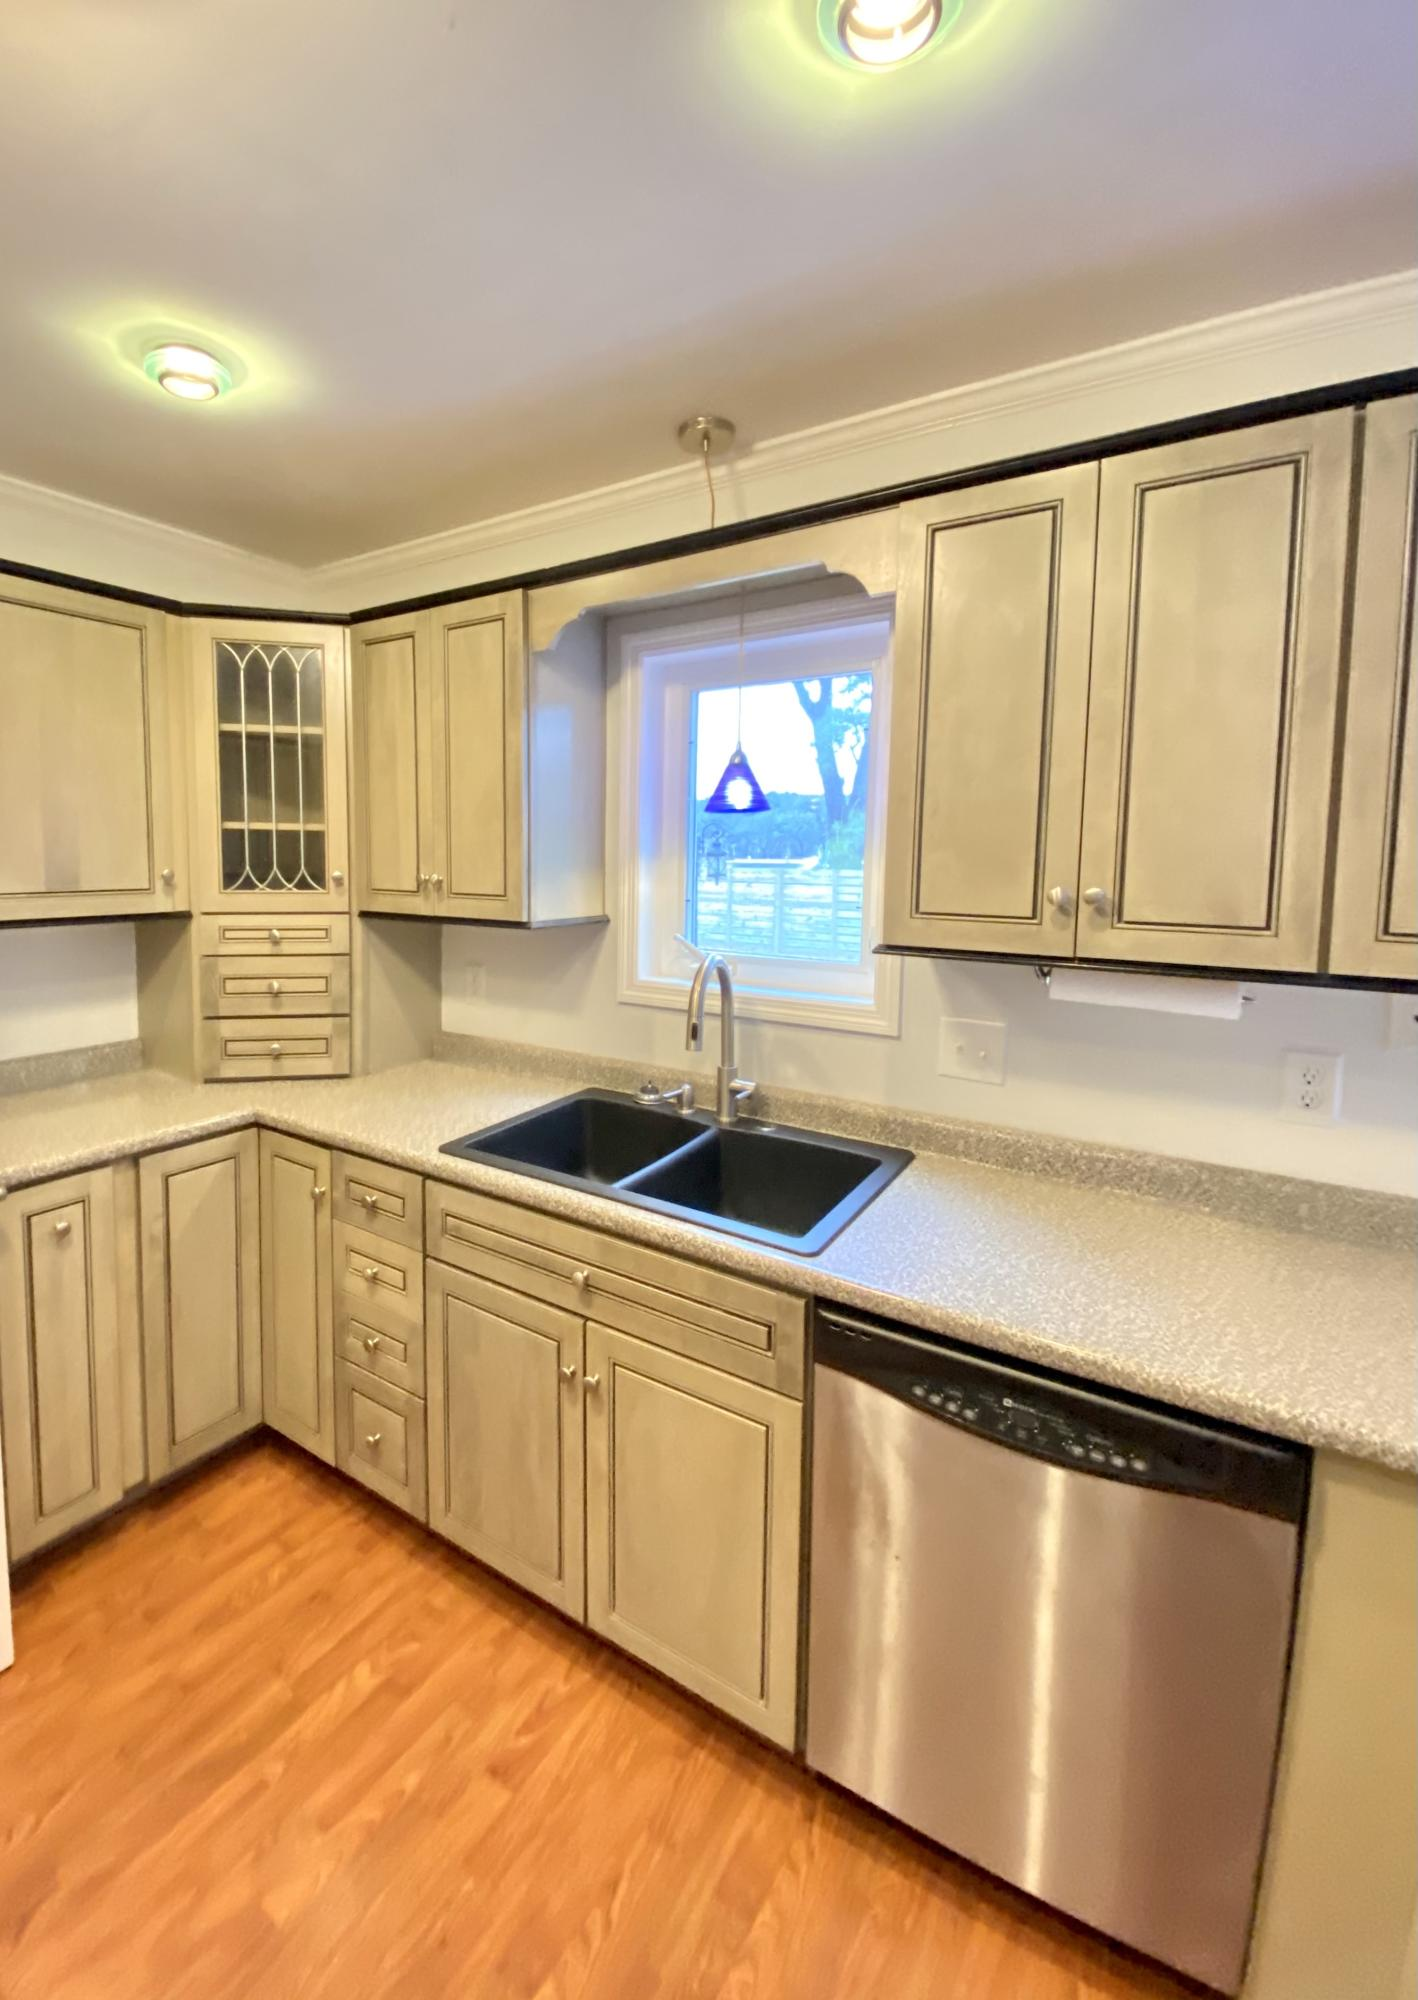 Palmetto Fort Homes For Sale - 1510 Lakeshore, Mount Pleasant, SC - 23